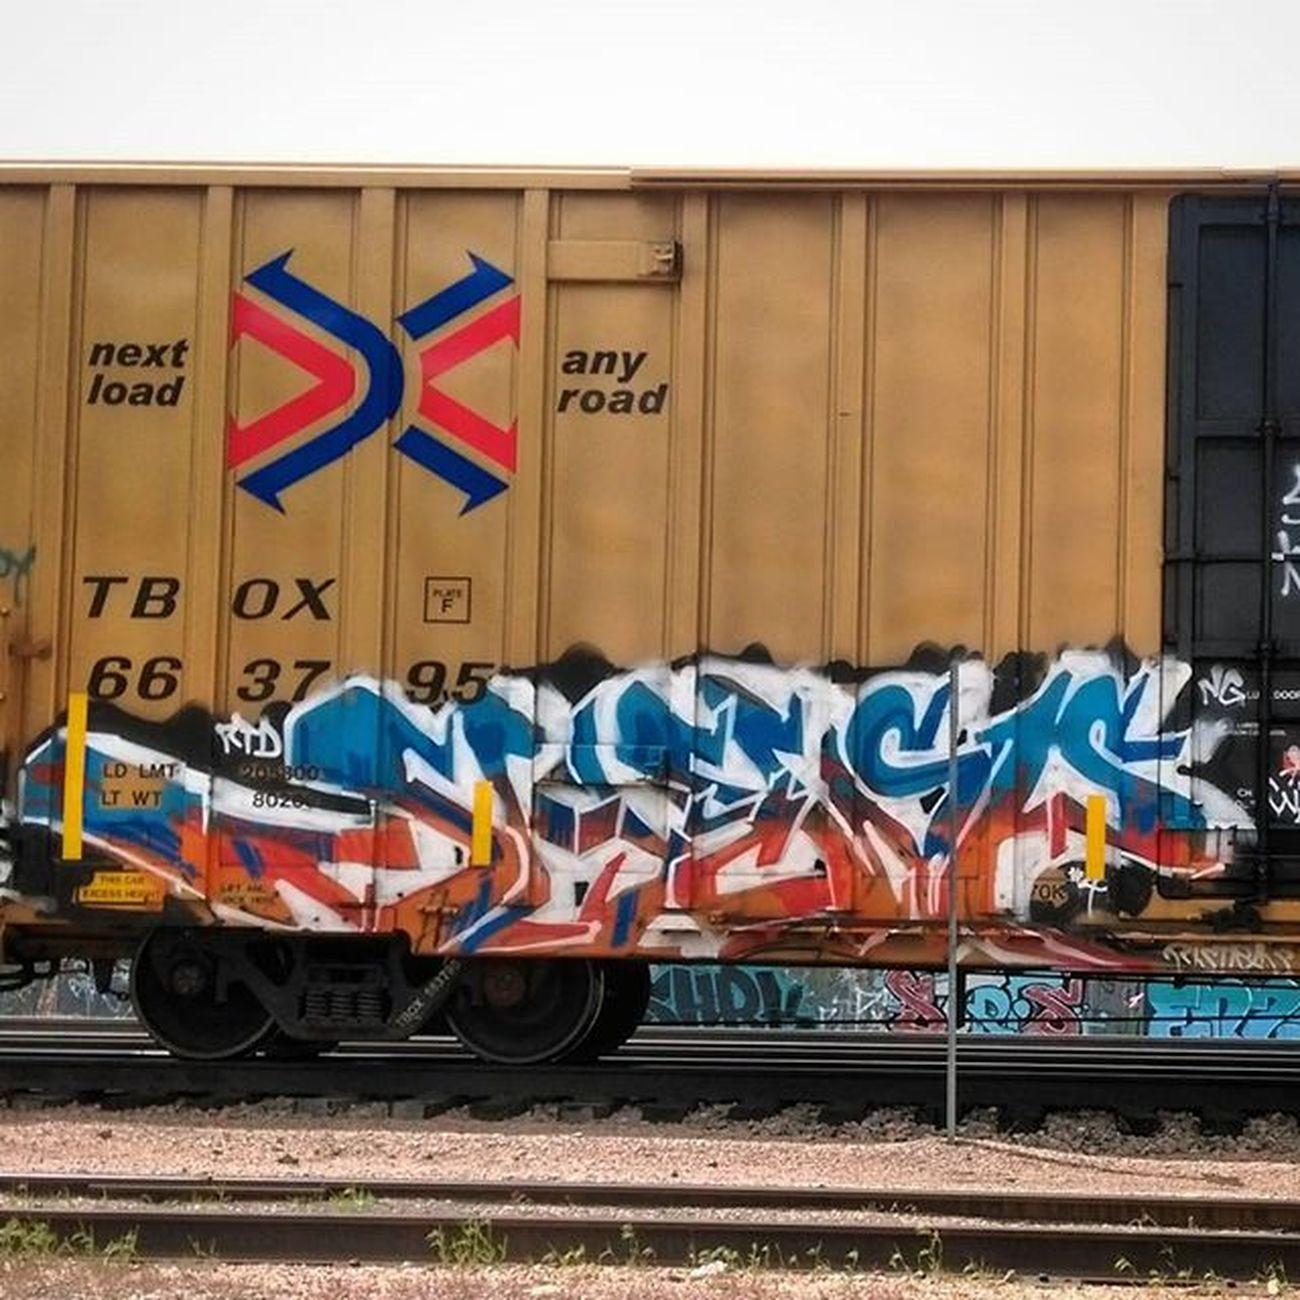 Trains Train Trainswithgraffiti Benched Benching Fr8 Fr8Heaven Freighttraingraffiti Shewp RTD